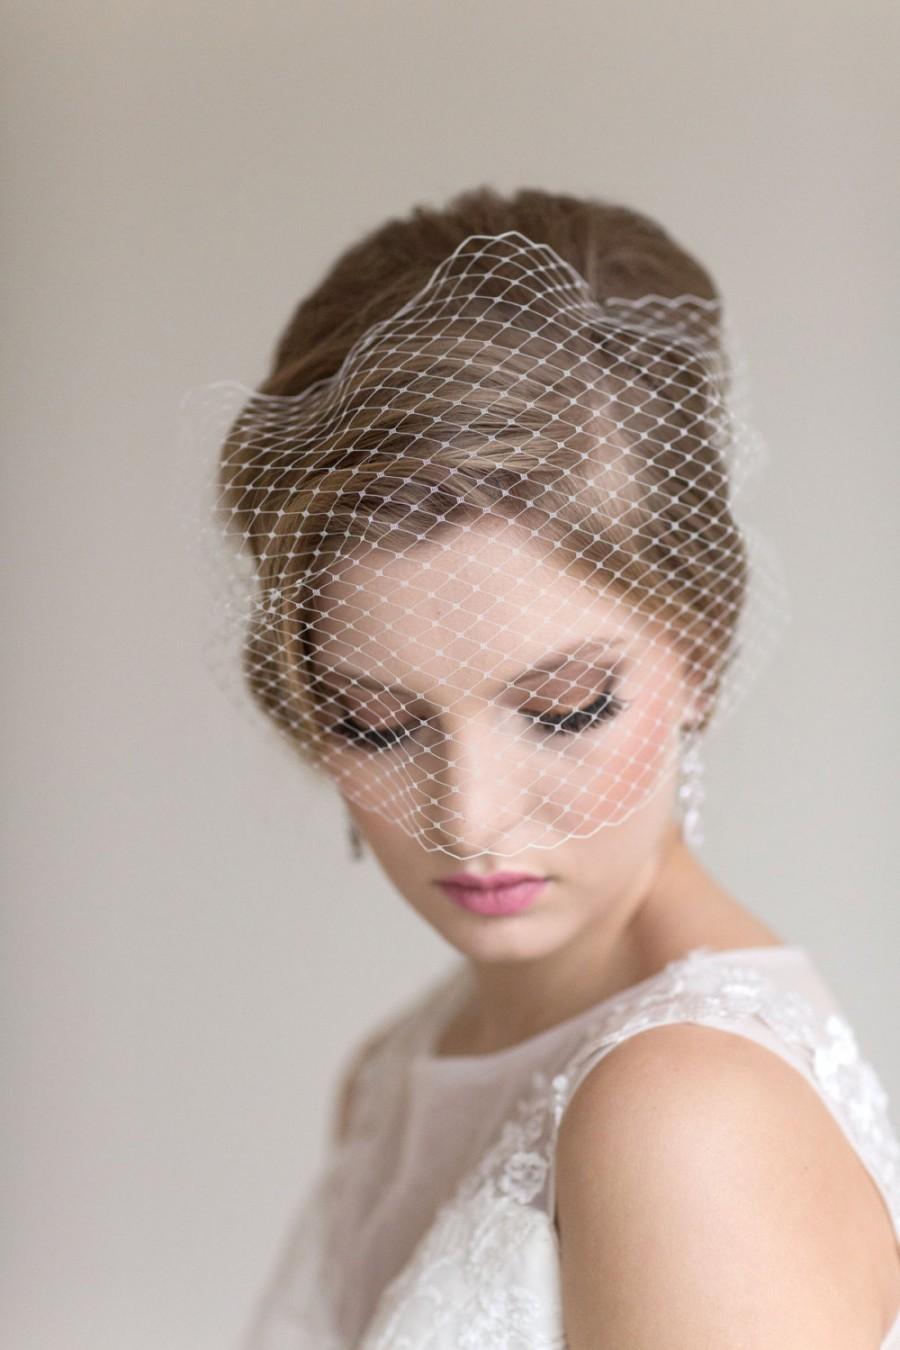 Mariage - Birdcage Wedding Veil, Wedding Birdcage Veil, Bandeau Veil, Bridal Veil, Net Veil, Wedding Veil